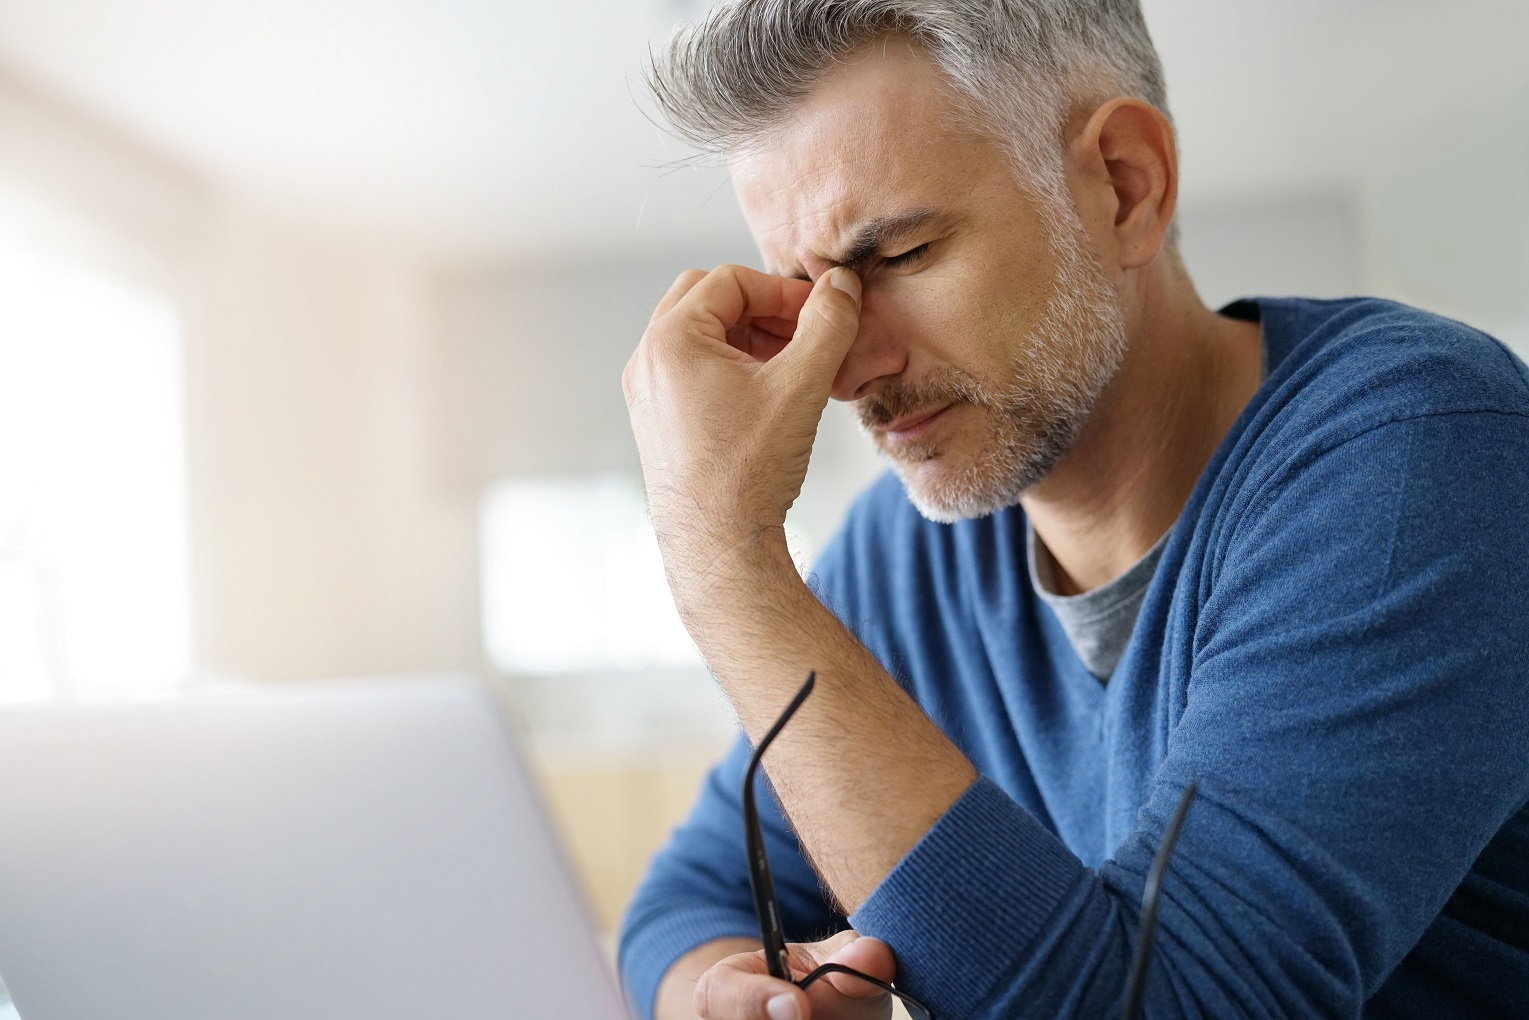 headache can lower prescription glasses damage eyes